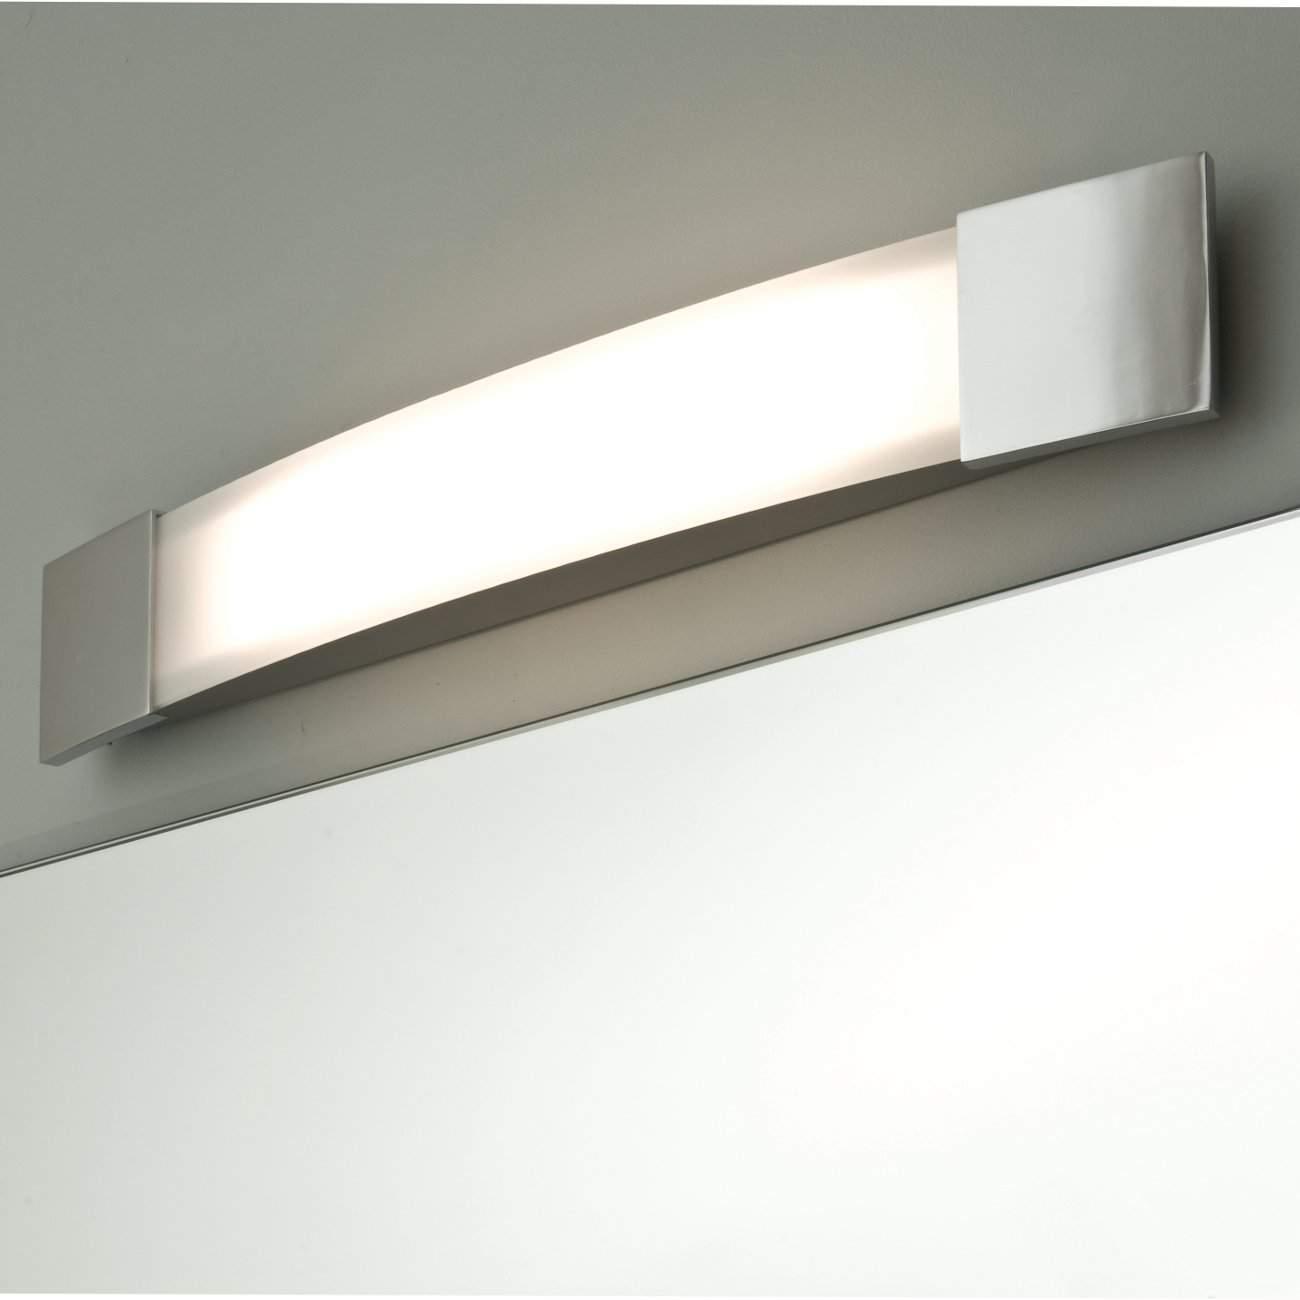 Led Lampen Für Garten Neu Badezimmerspiegel Led Lampe